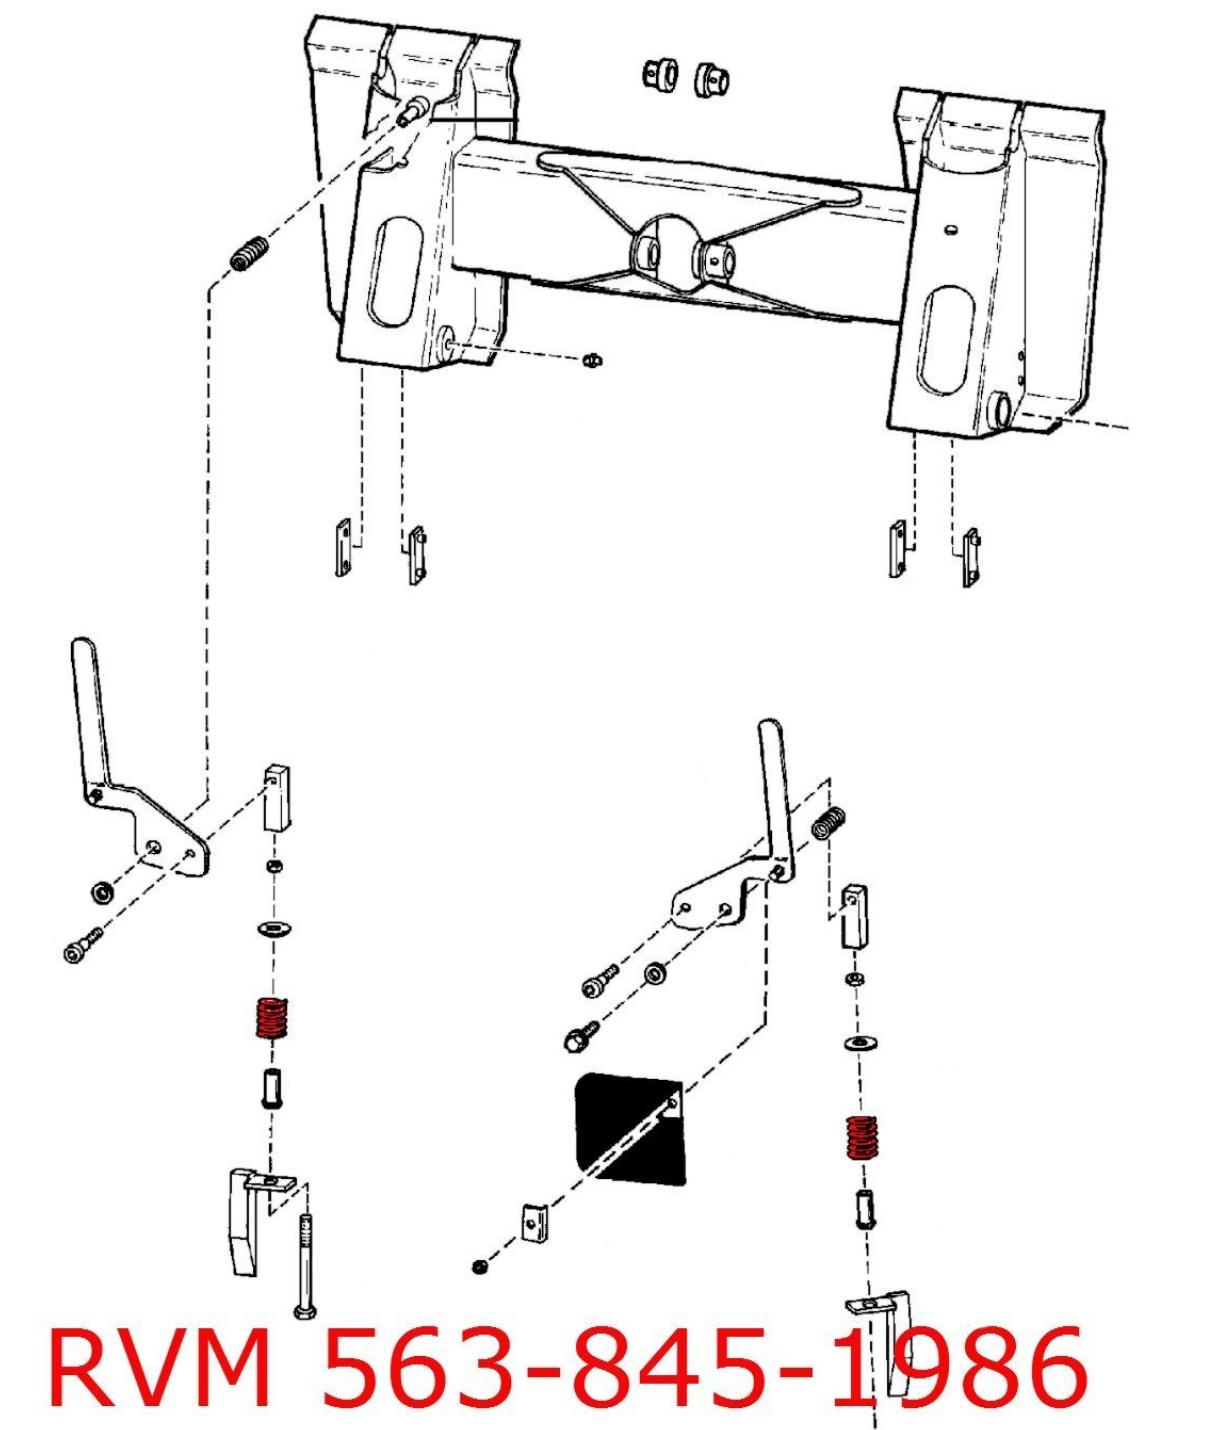 bobcat 864 wiring diagram compression spring  6578253  for quick attach handle   wedge  for quick attach handle   wedge